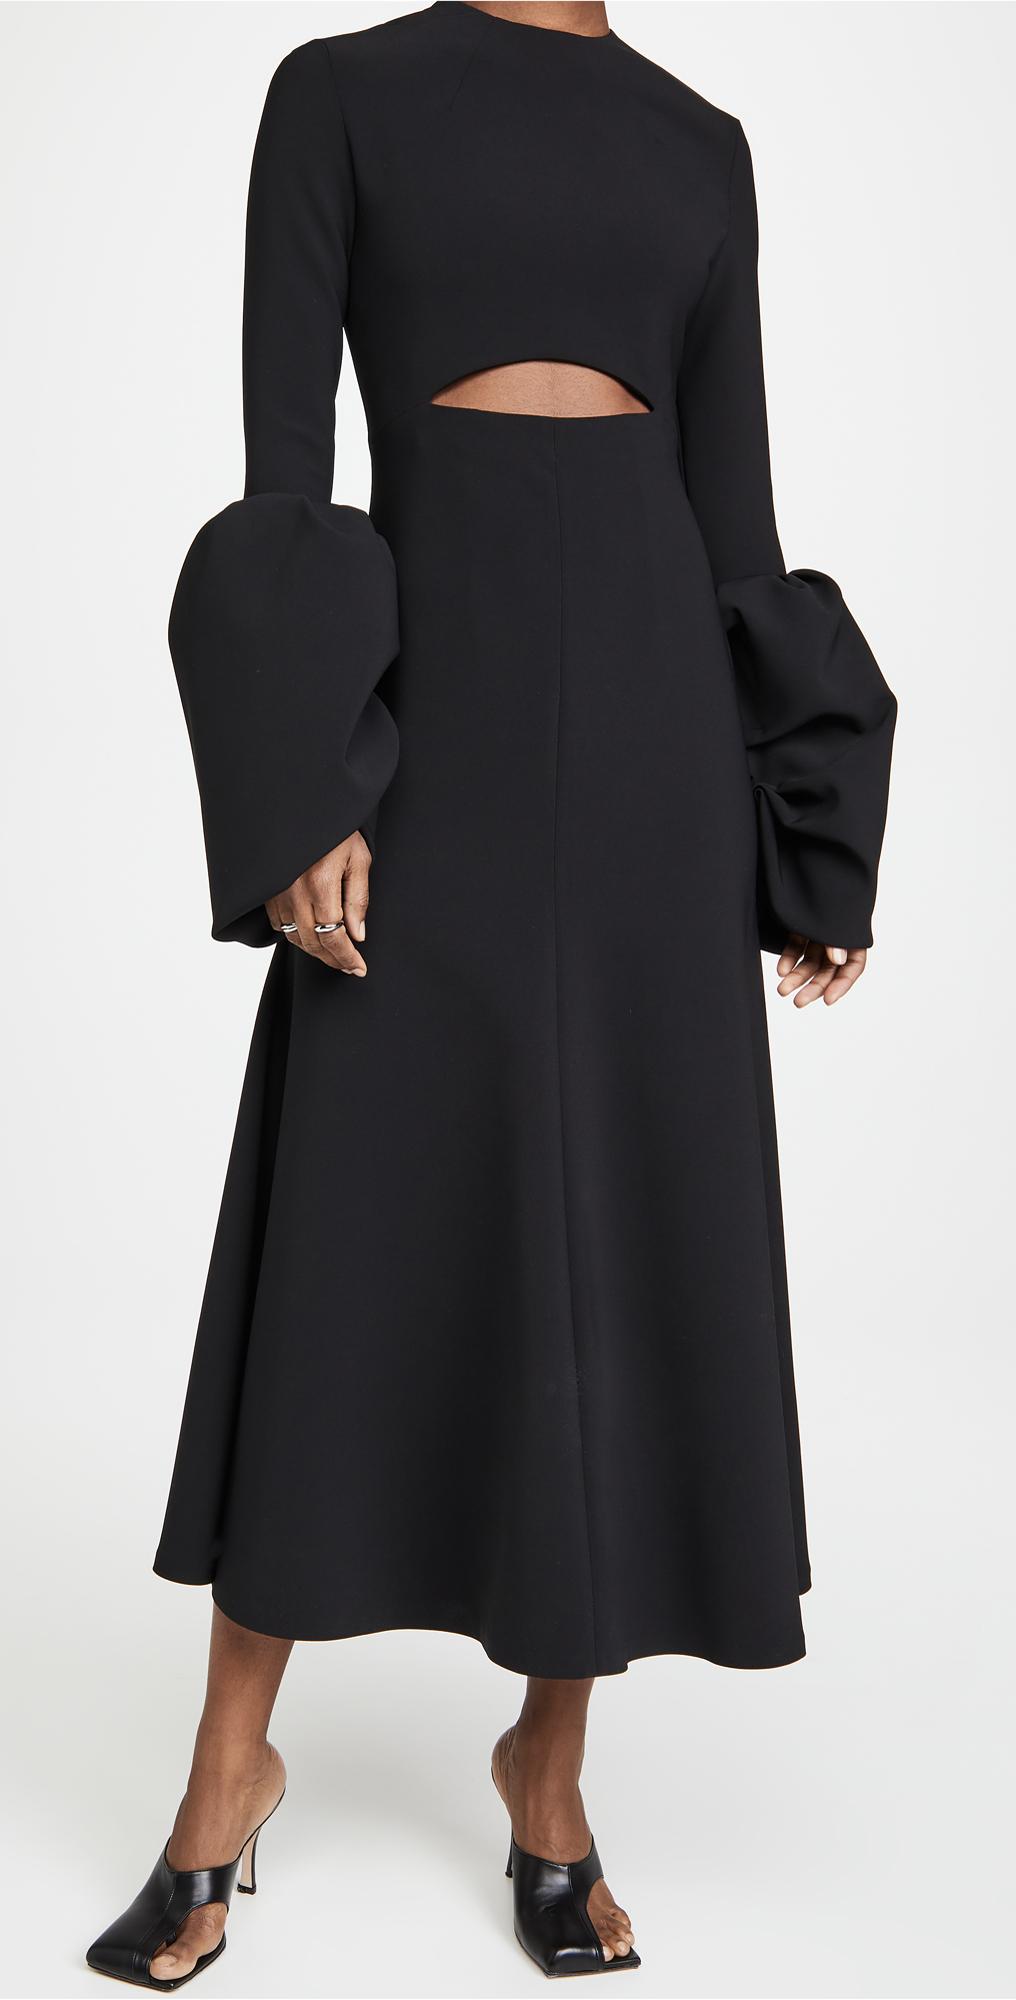 A.W.A.K.E MODE Puff Sleeve Maxi Dress